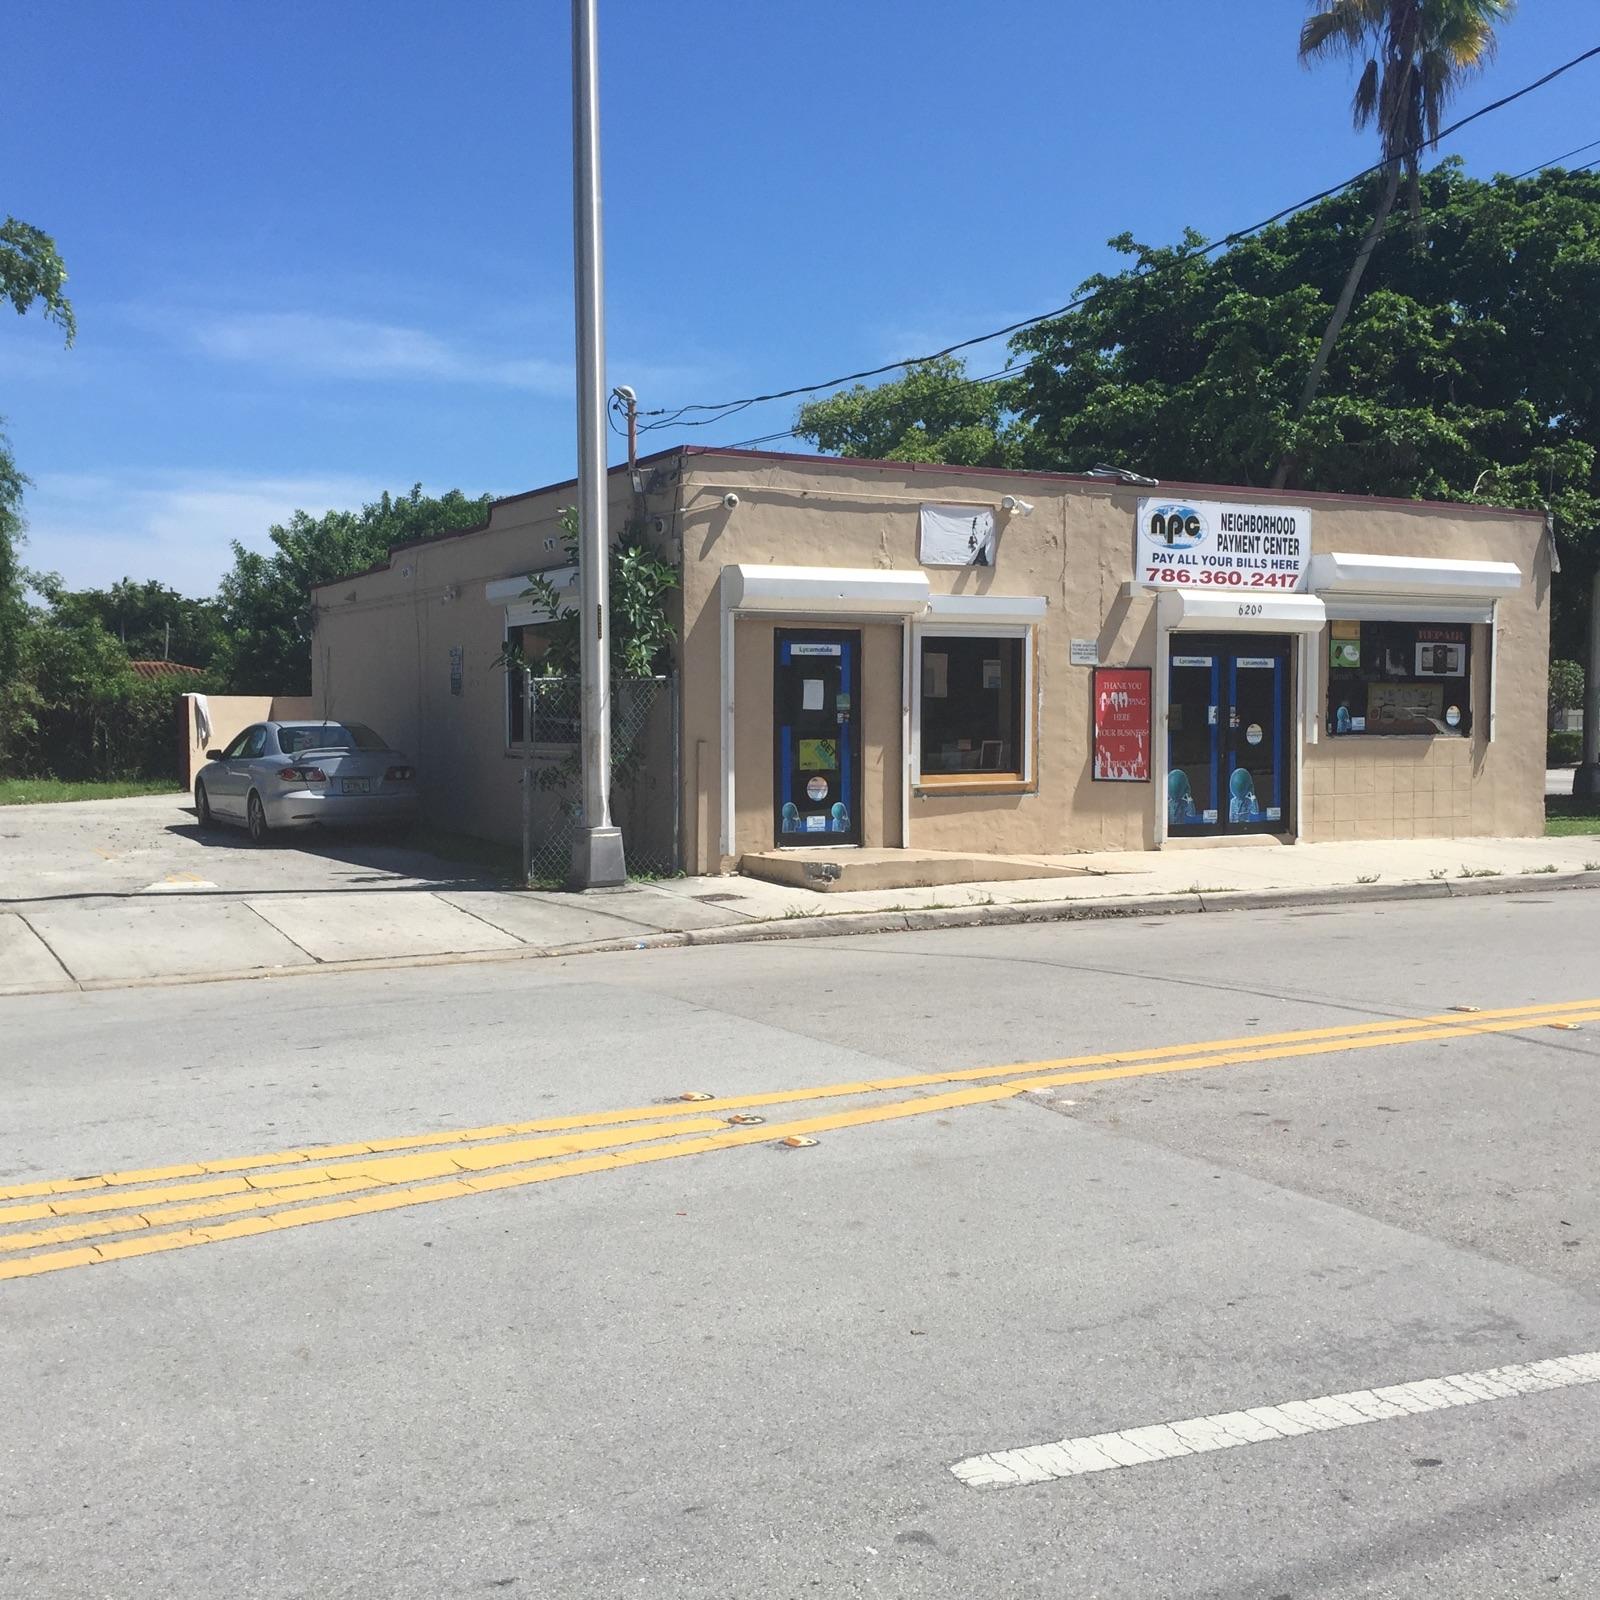 Neighborhood Payment Center (NPC)